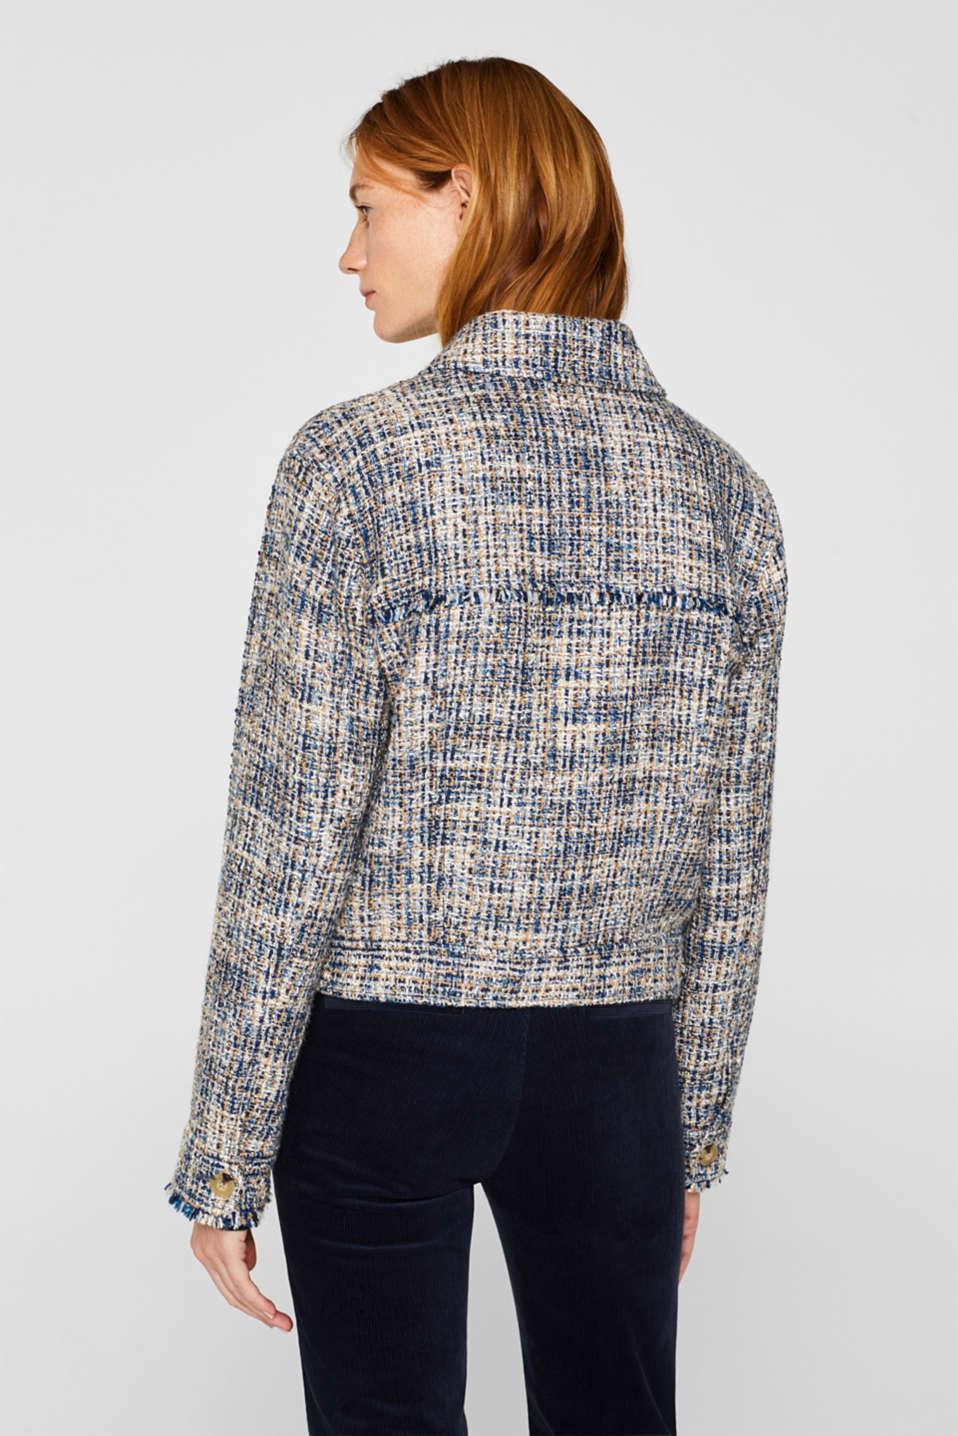 Jackets indoor woven, NAVY, detail image number 3